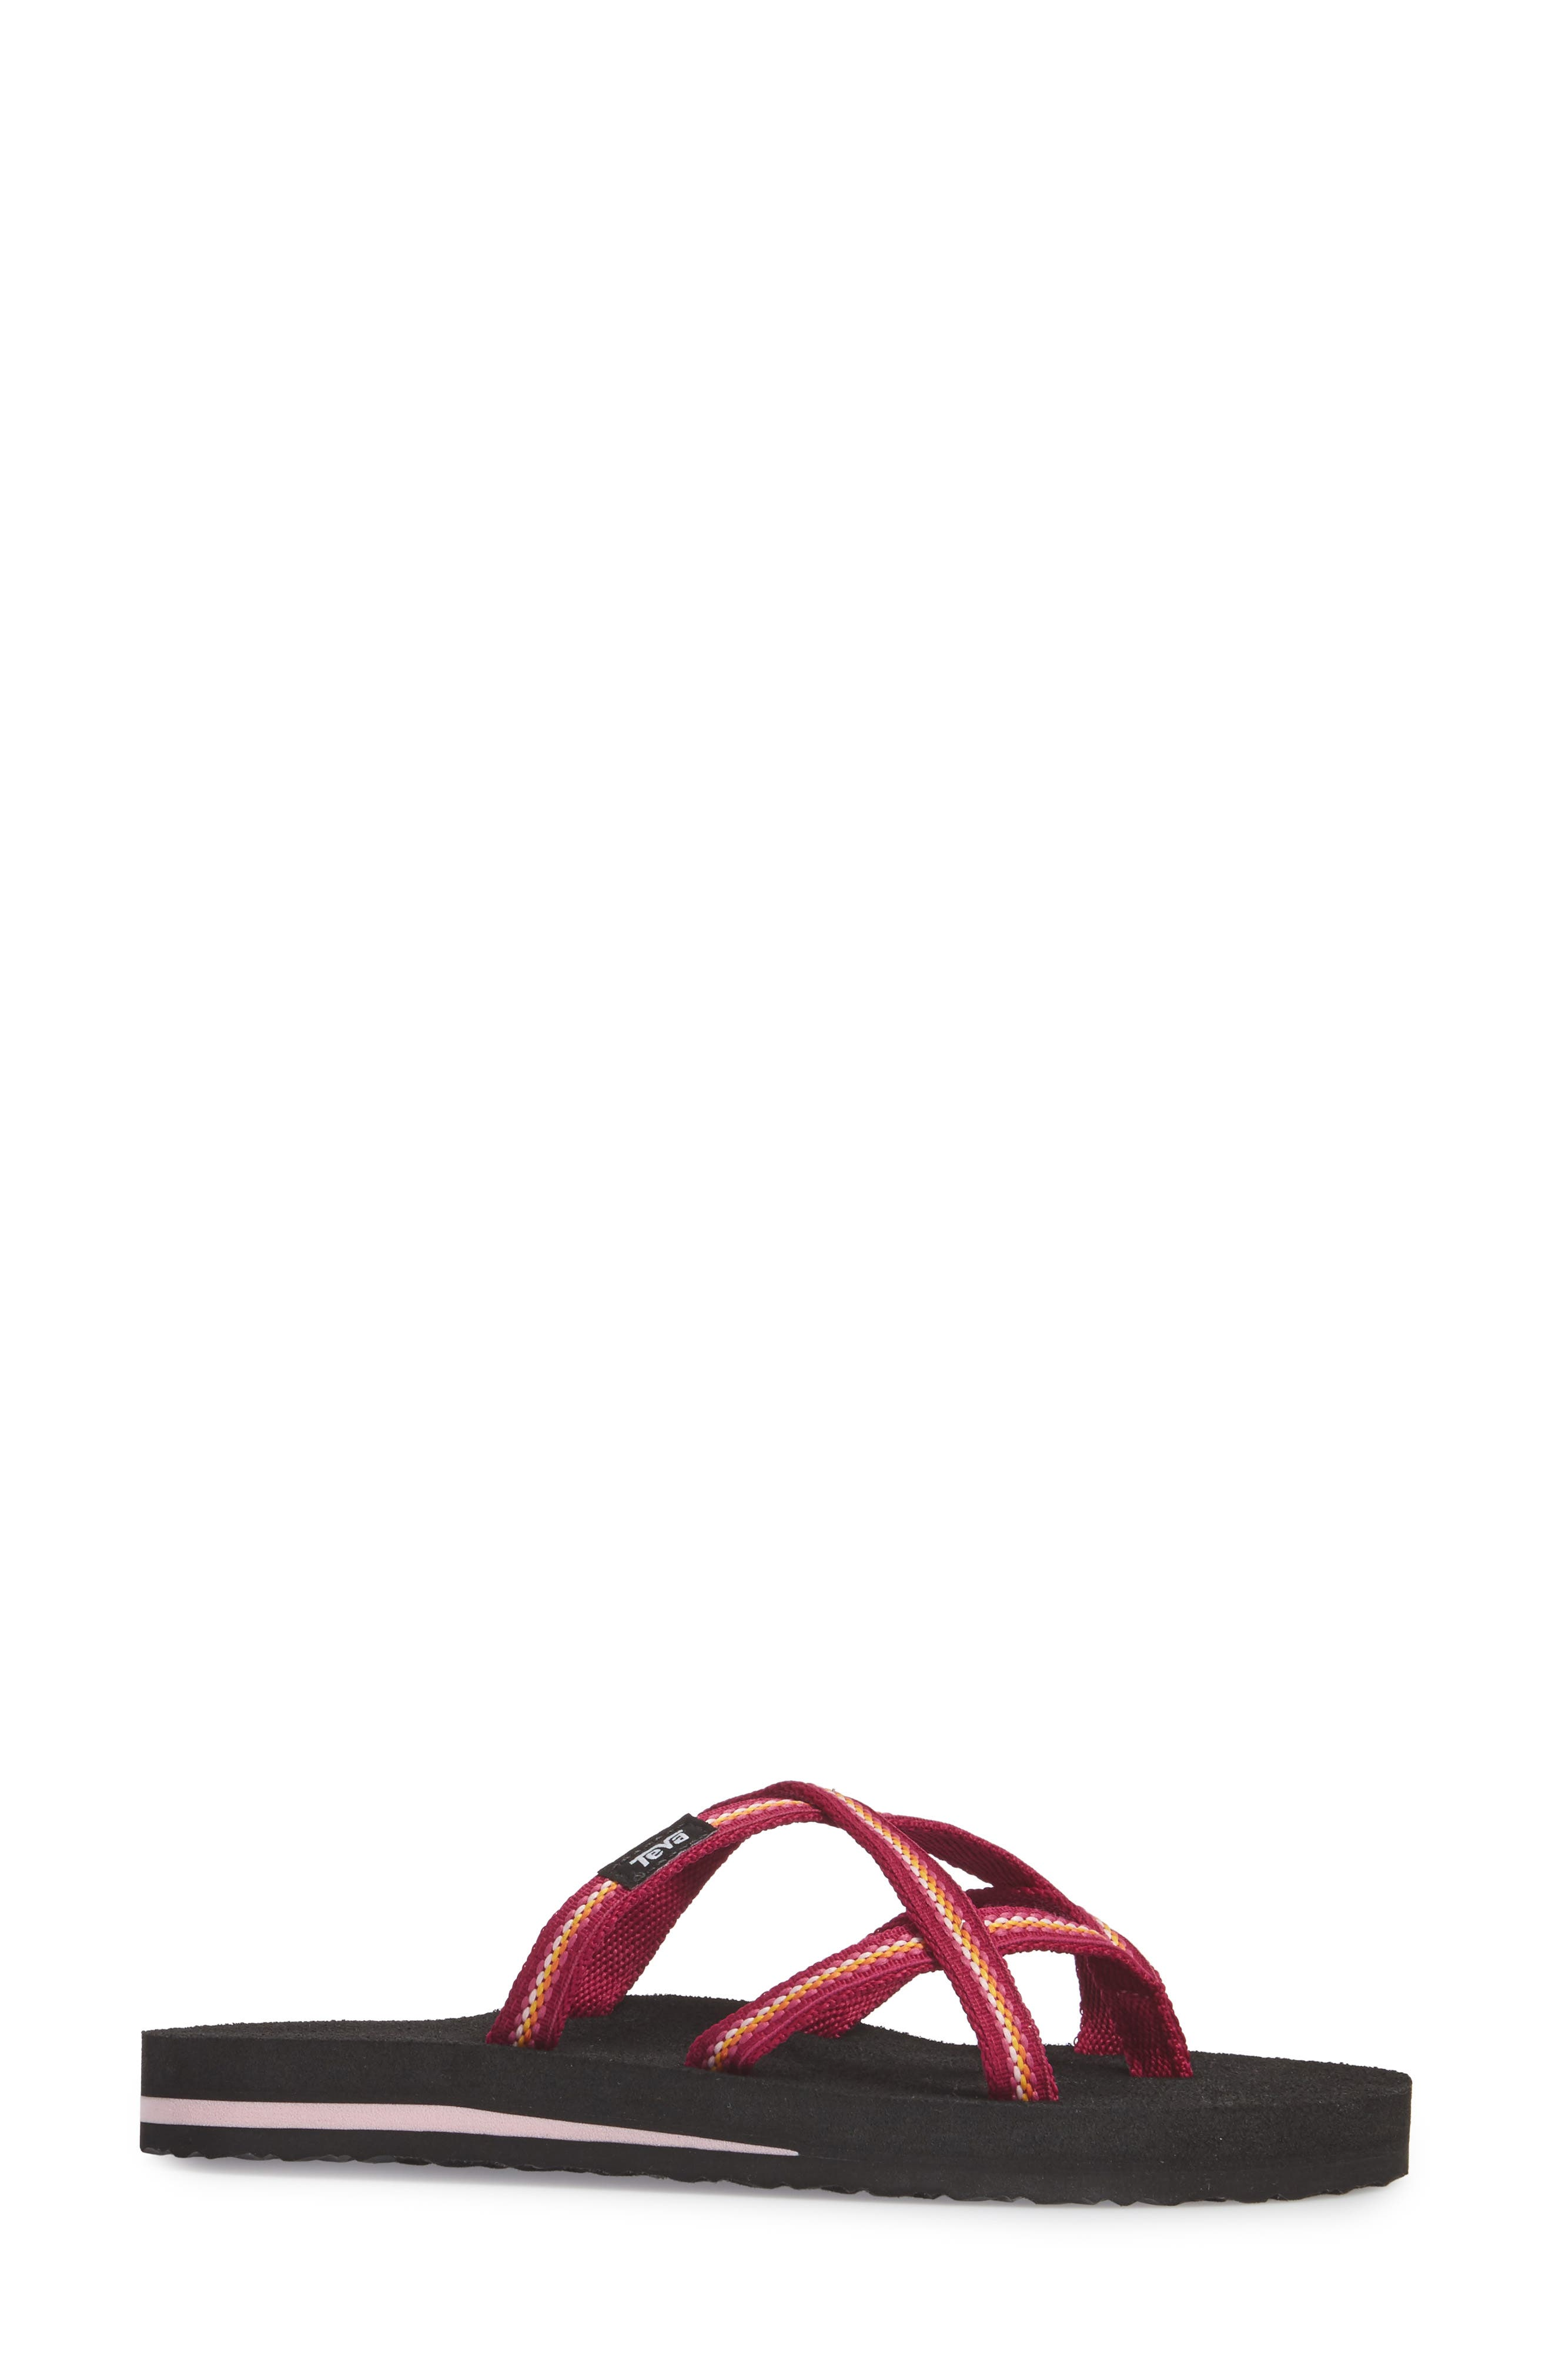 'Olowahu' Sandal,                             Alternate thumbnail 3, color,                             BOYSENBERRY FABRIC